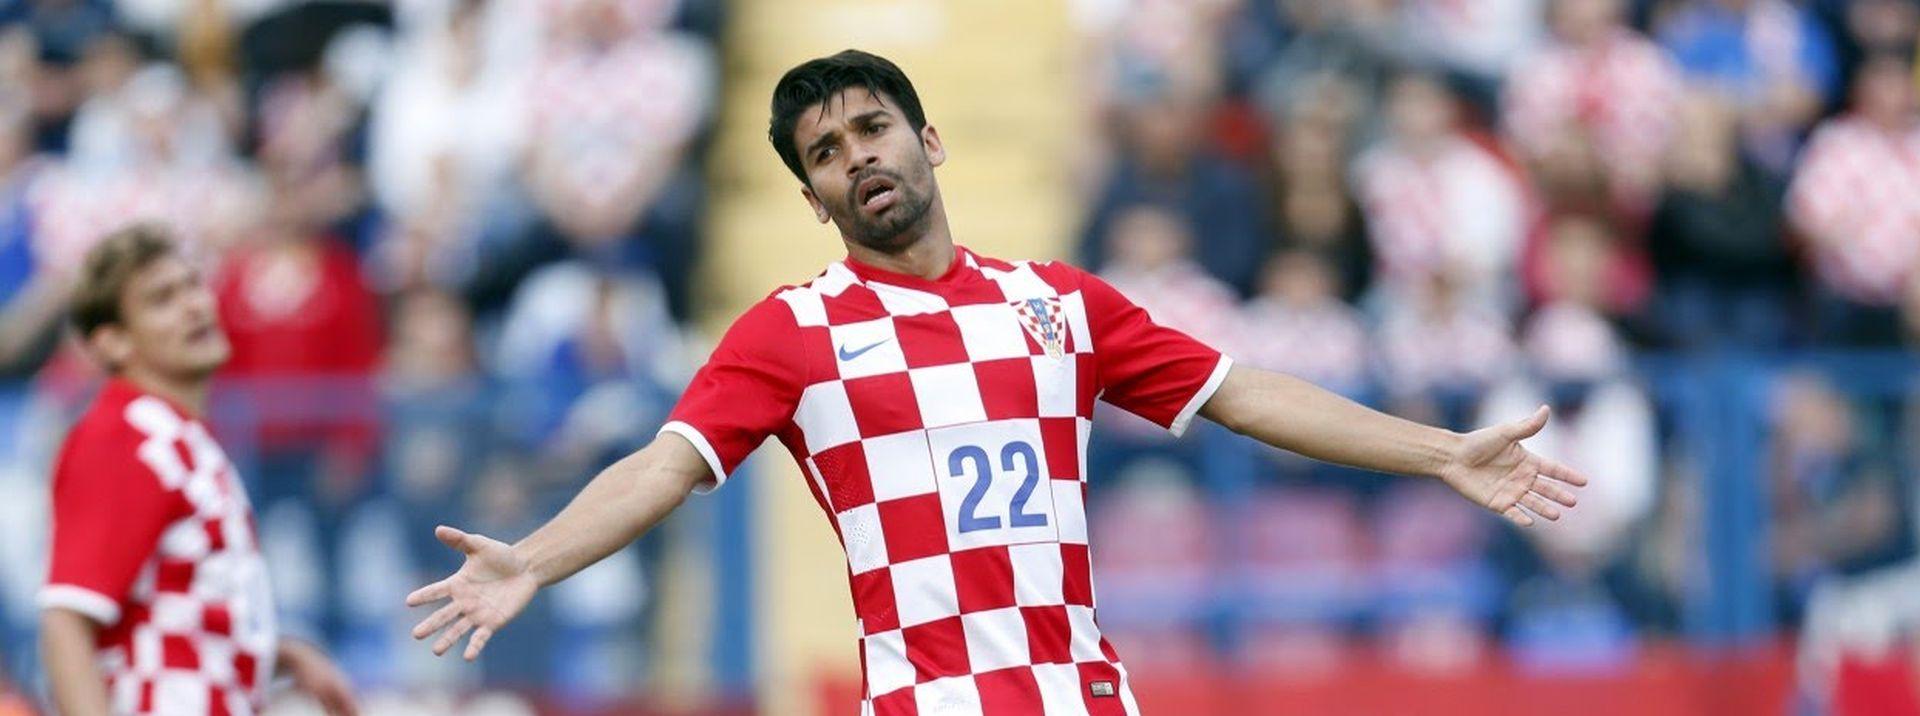 SENZACIJA NA POMOLU Vraća se veliki goleador Dudu